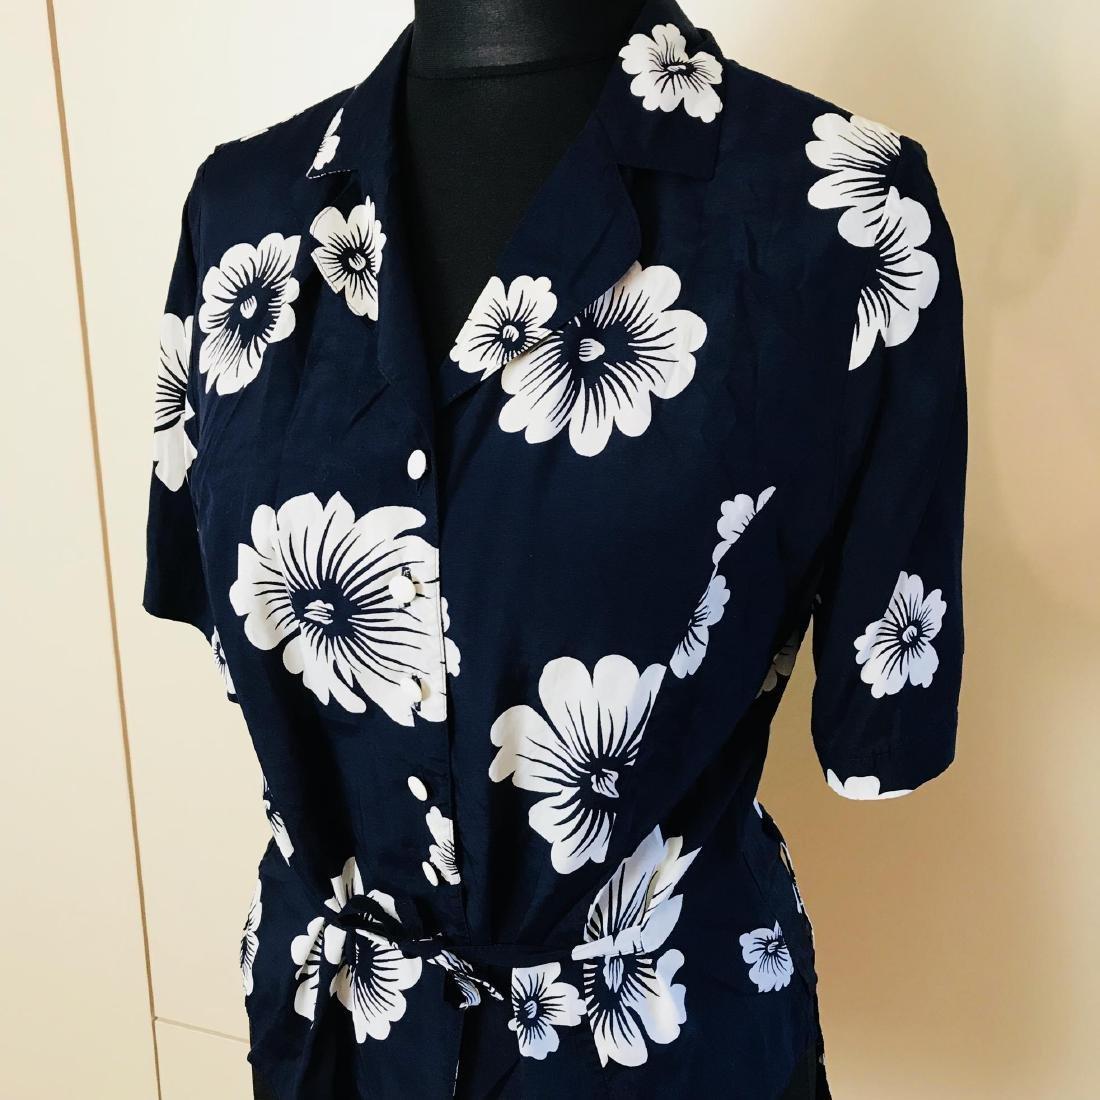 Vintage Women's Navy Blue Blouse Shirt Top - 2